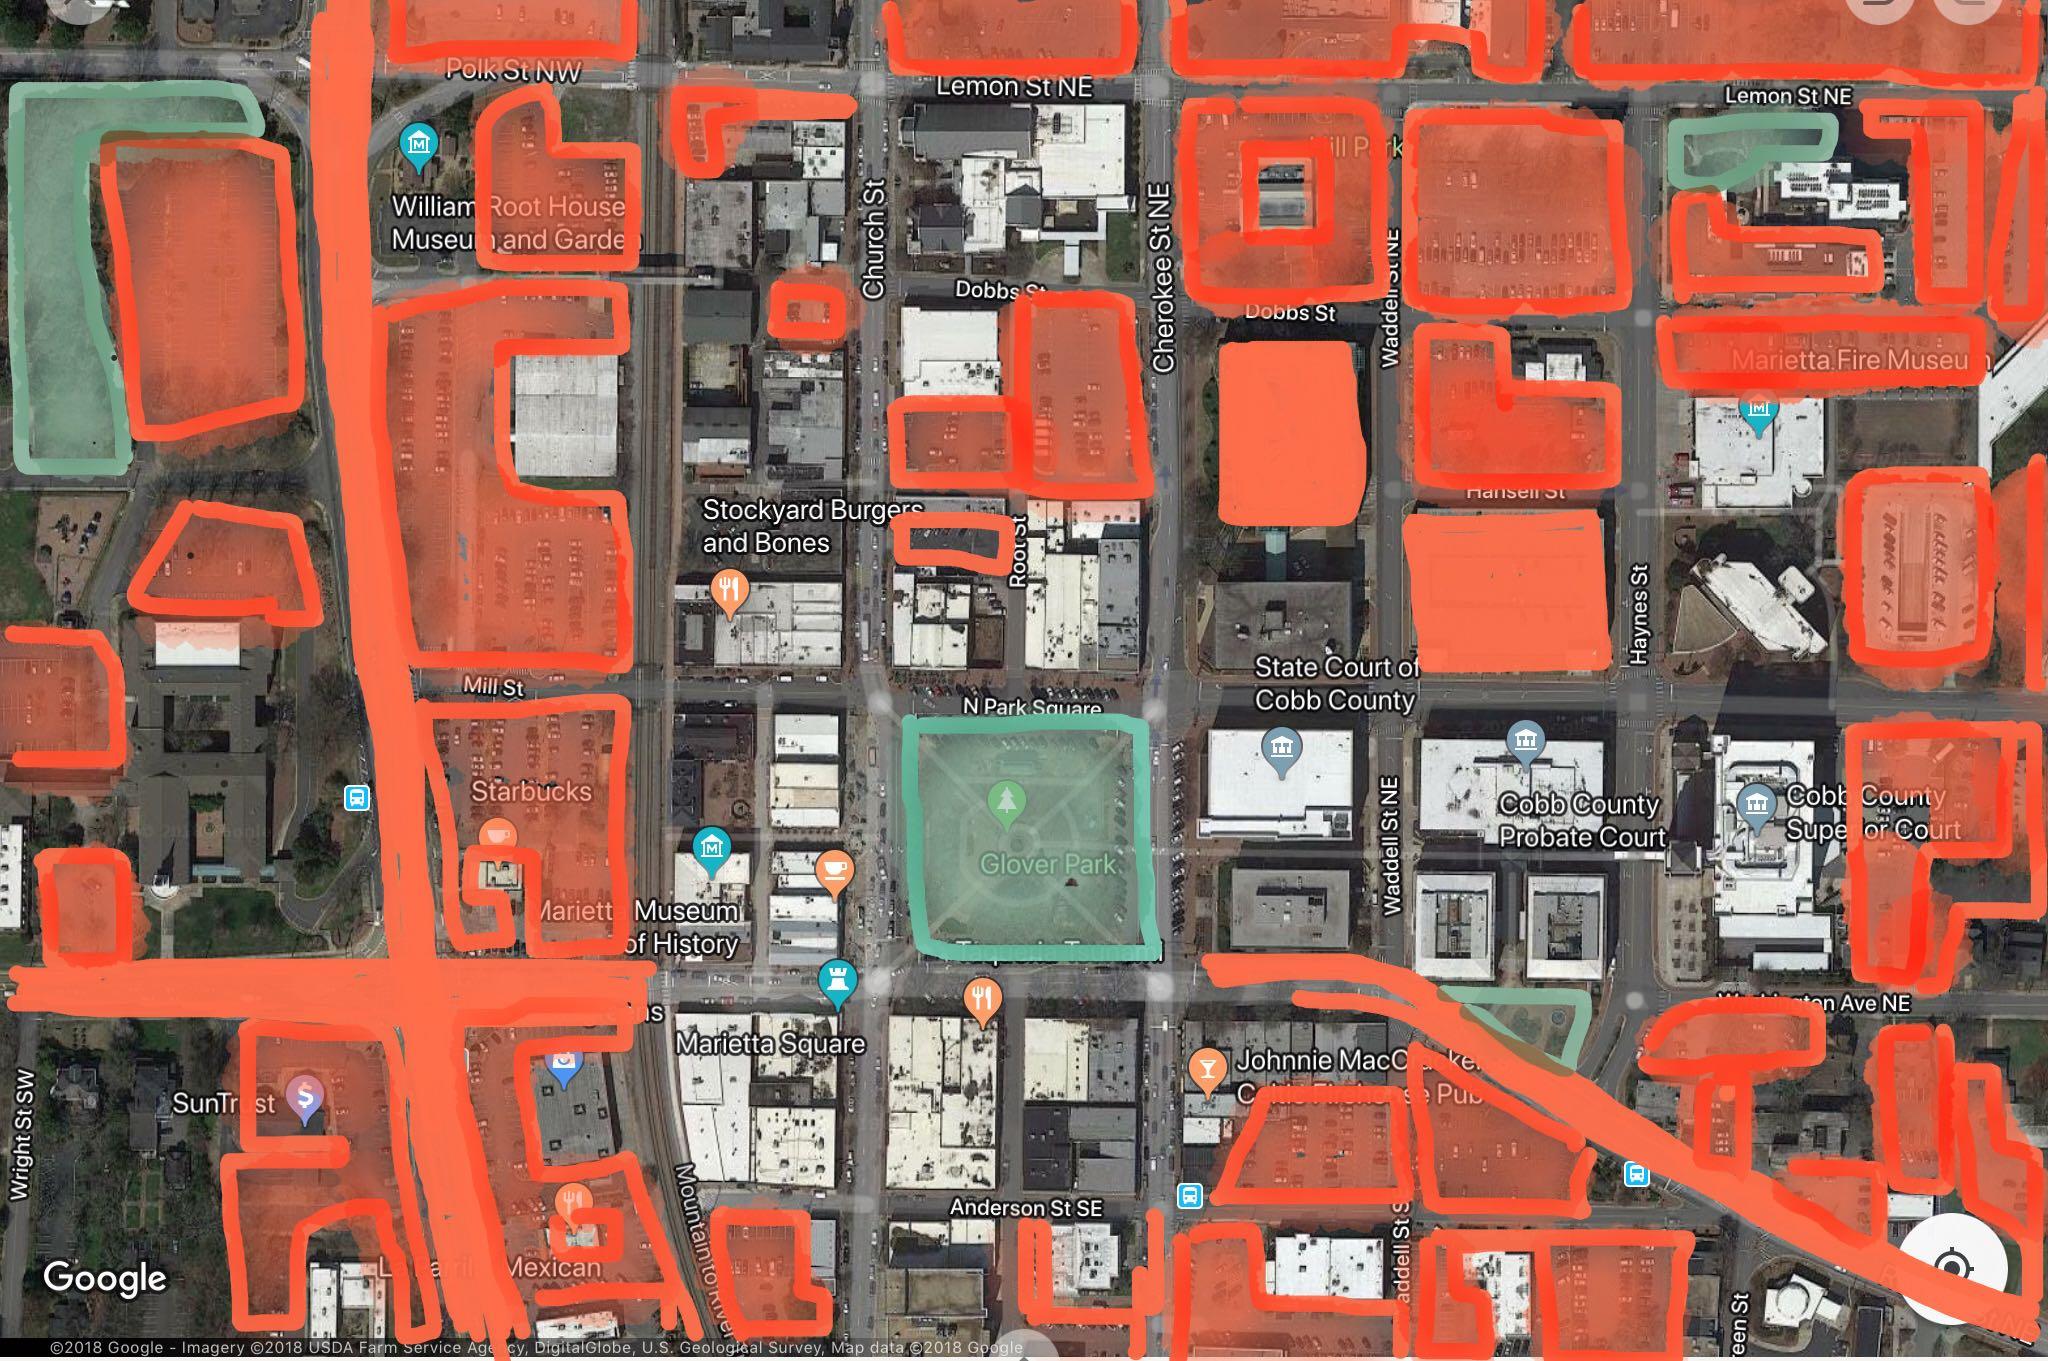 Marietta, GA. Source: Google Maps with modifications by Antonio Graña.